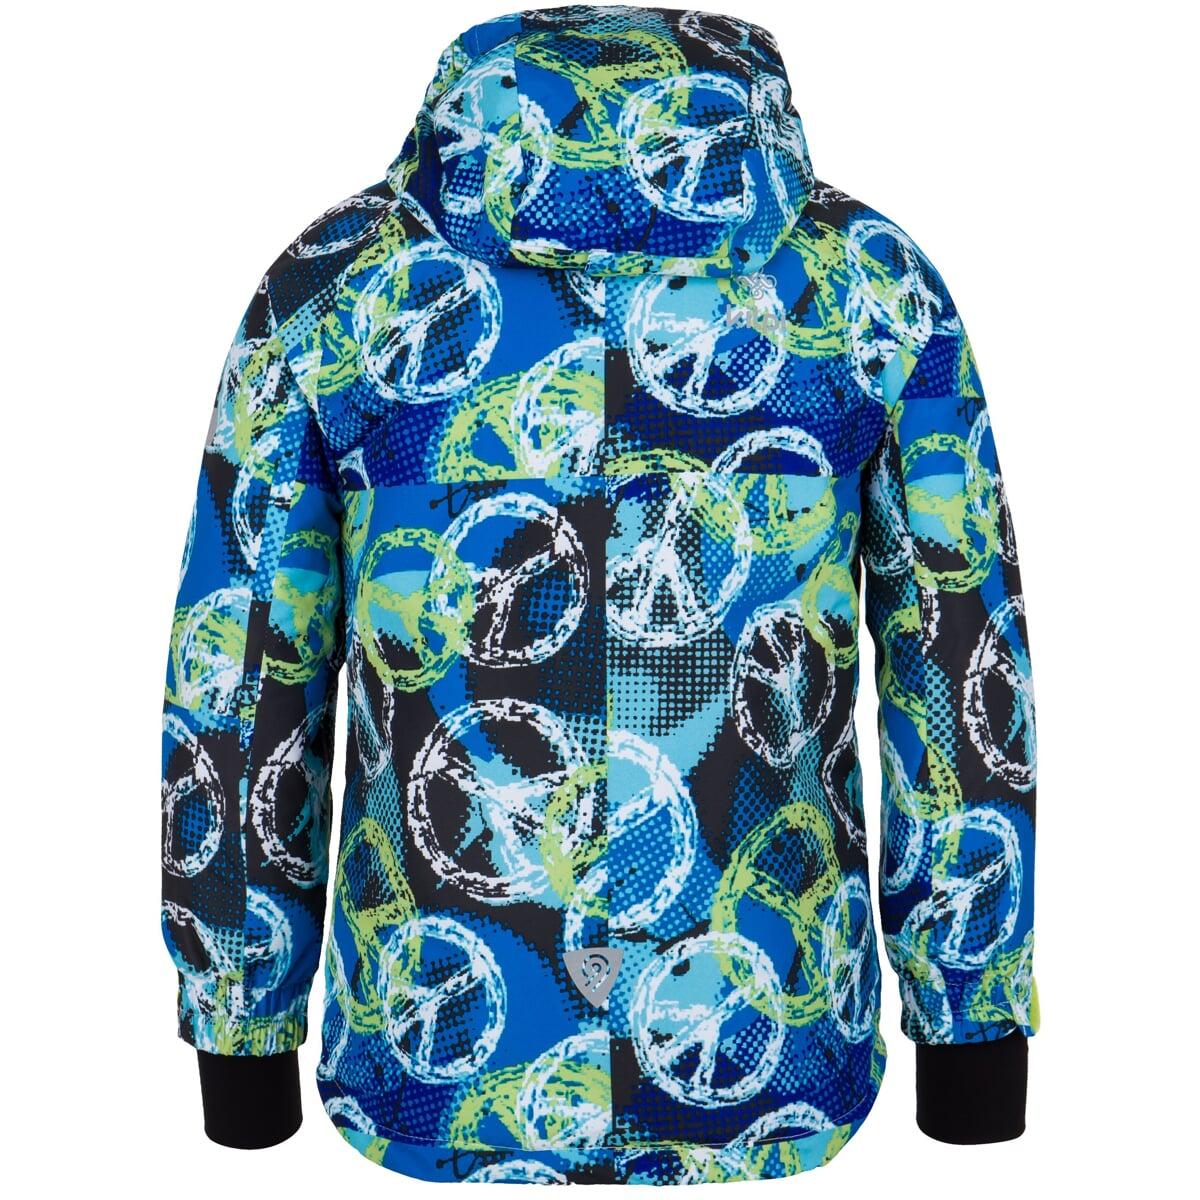 Chlapčenská zimná bunda Kilpi SEMERU-JB  29d3d4a8fab